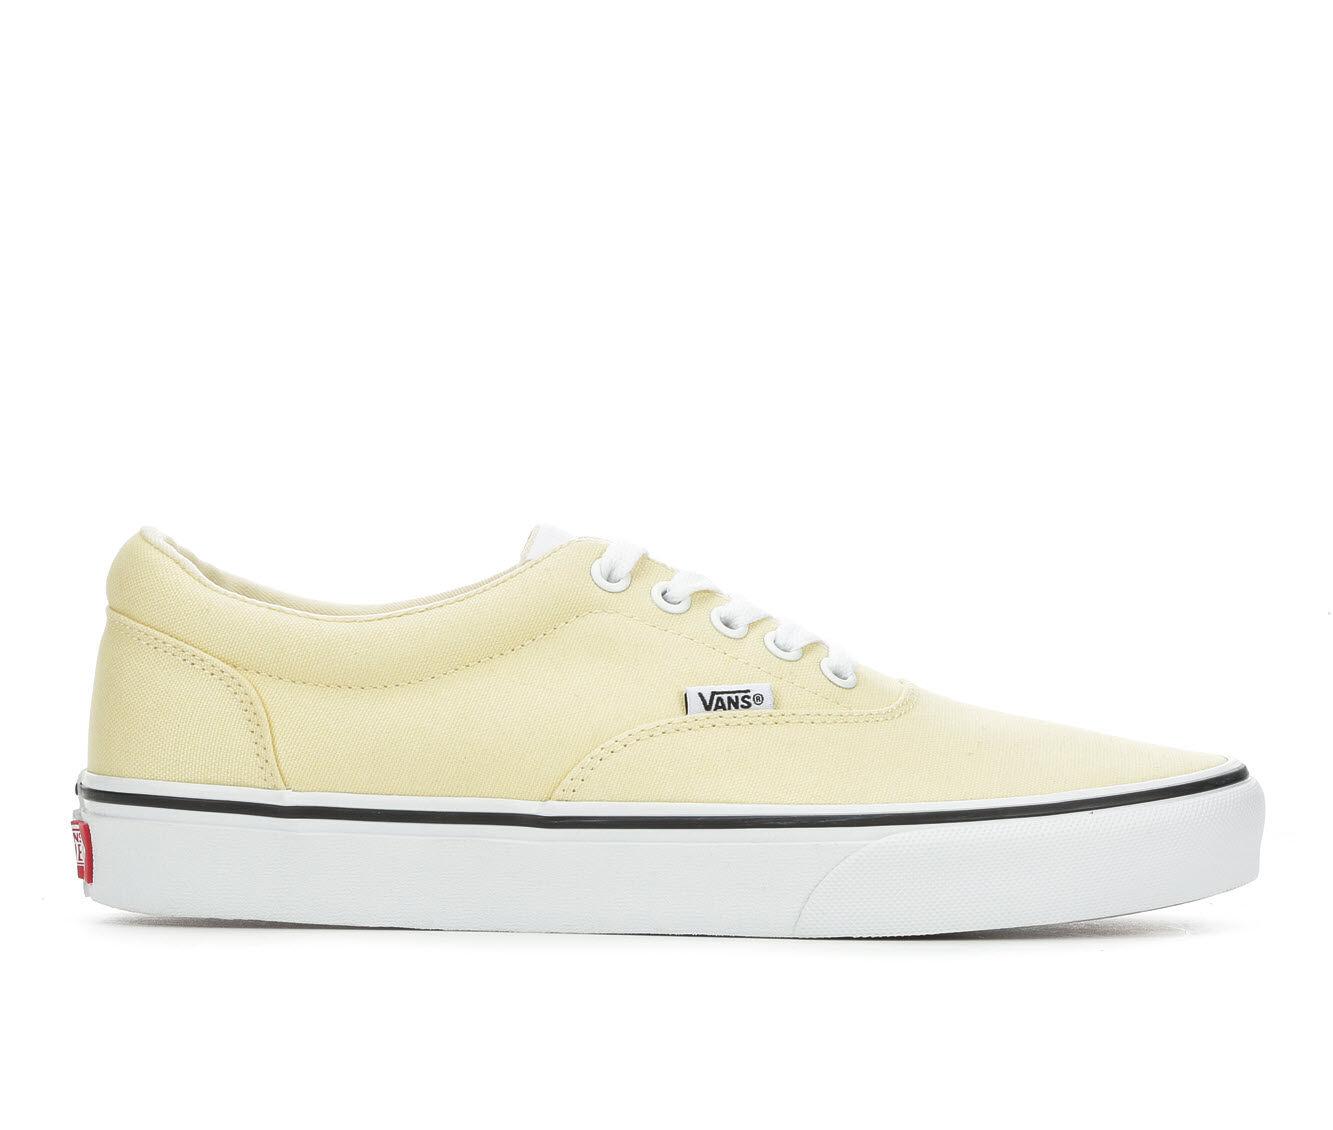 Men's Vans Doheny Skate Shoes Yellow/White